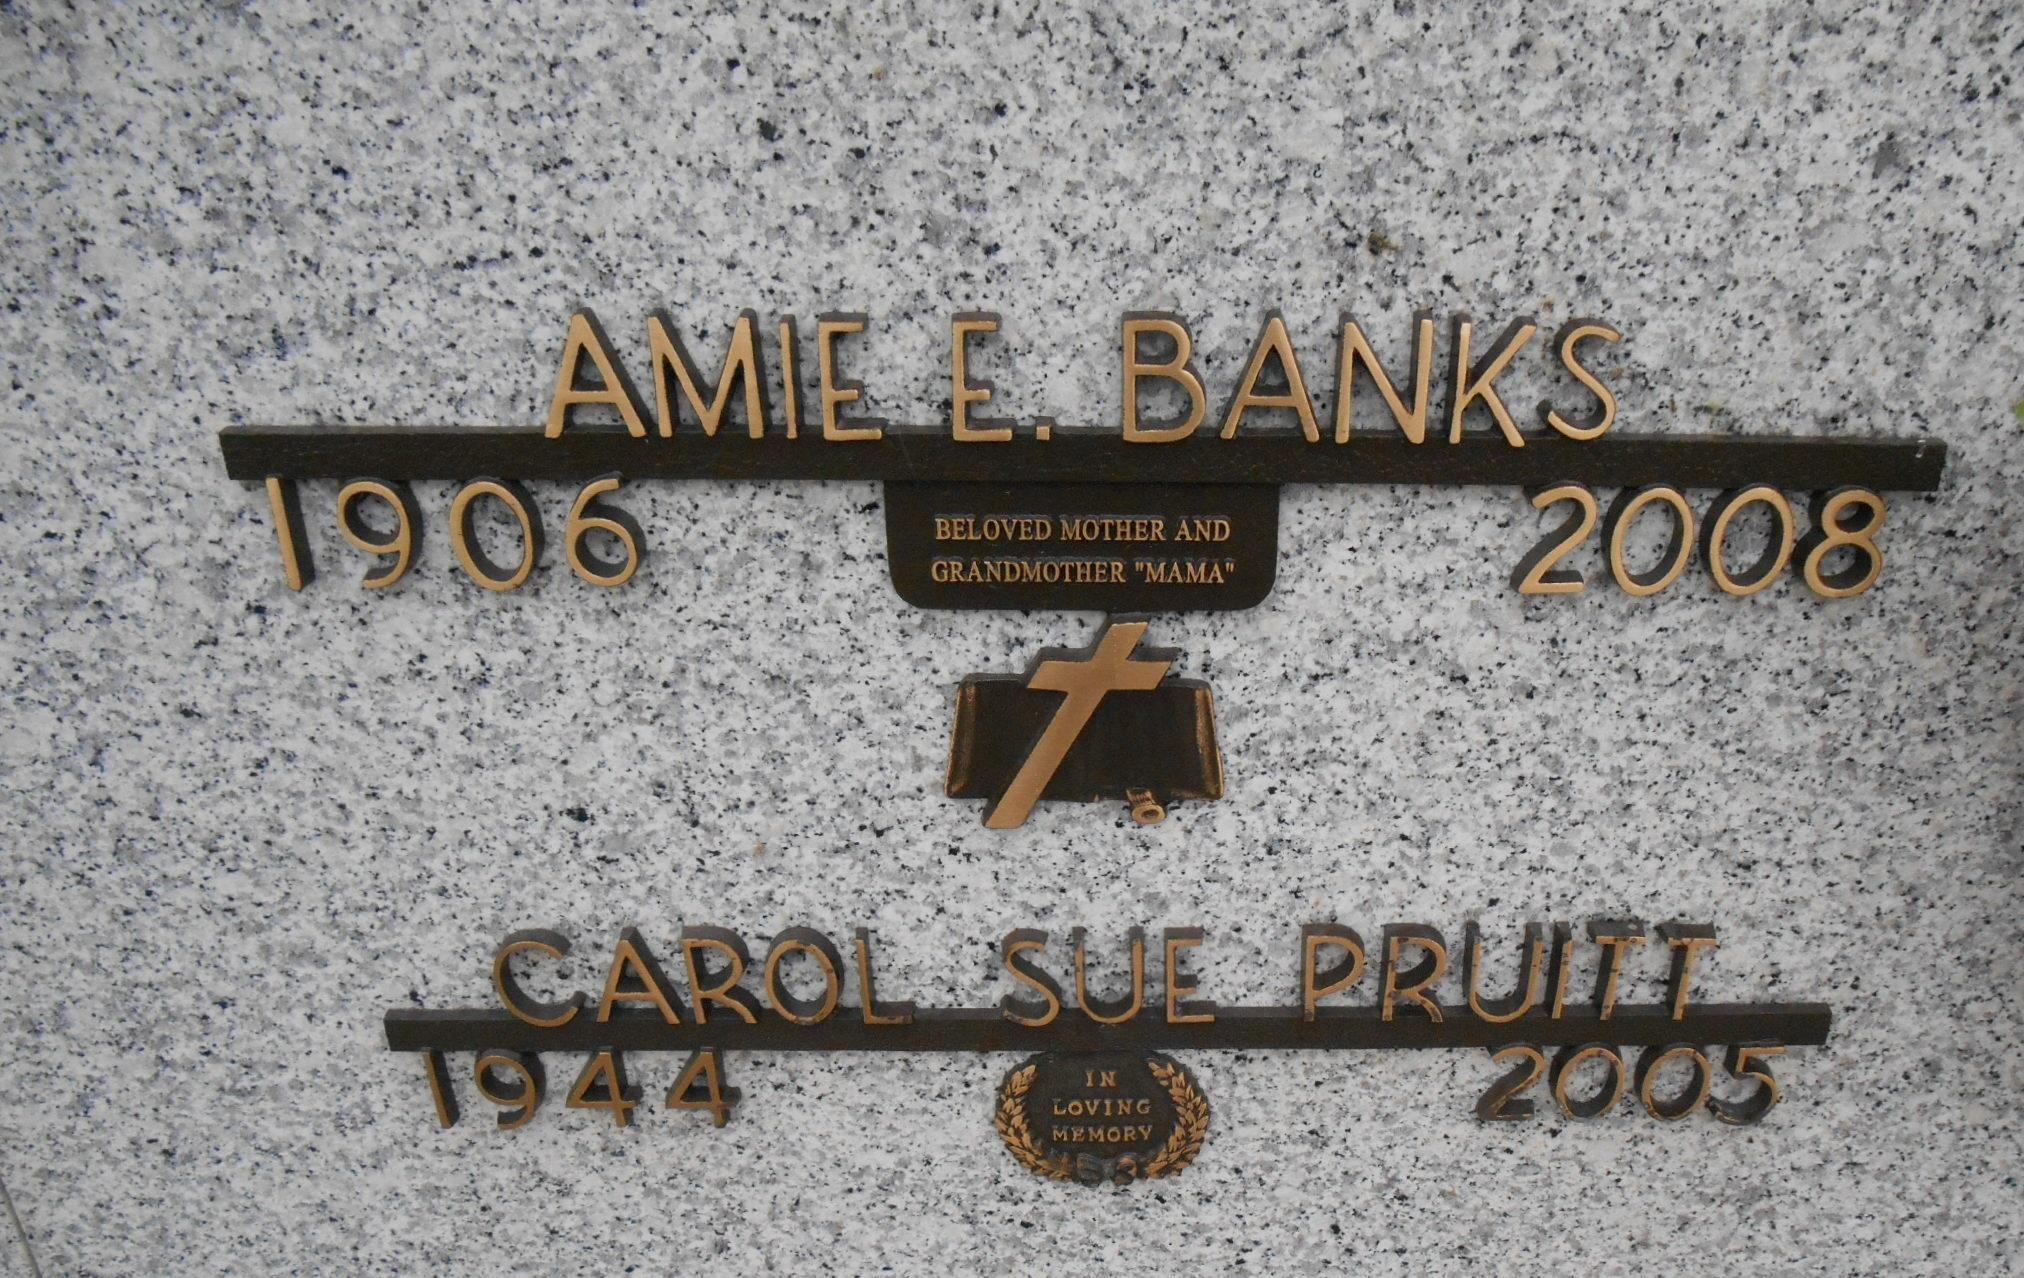 Amie E. Banks